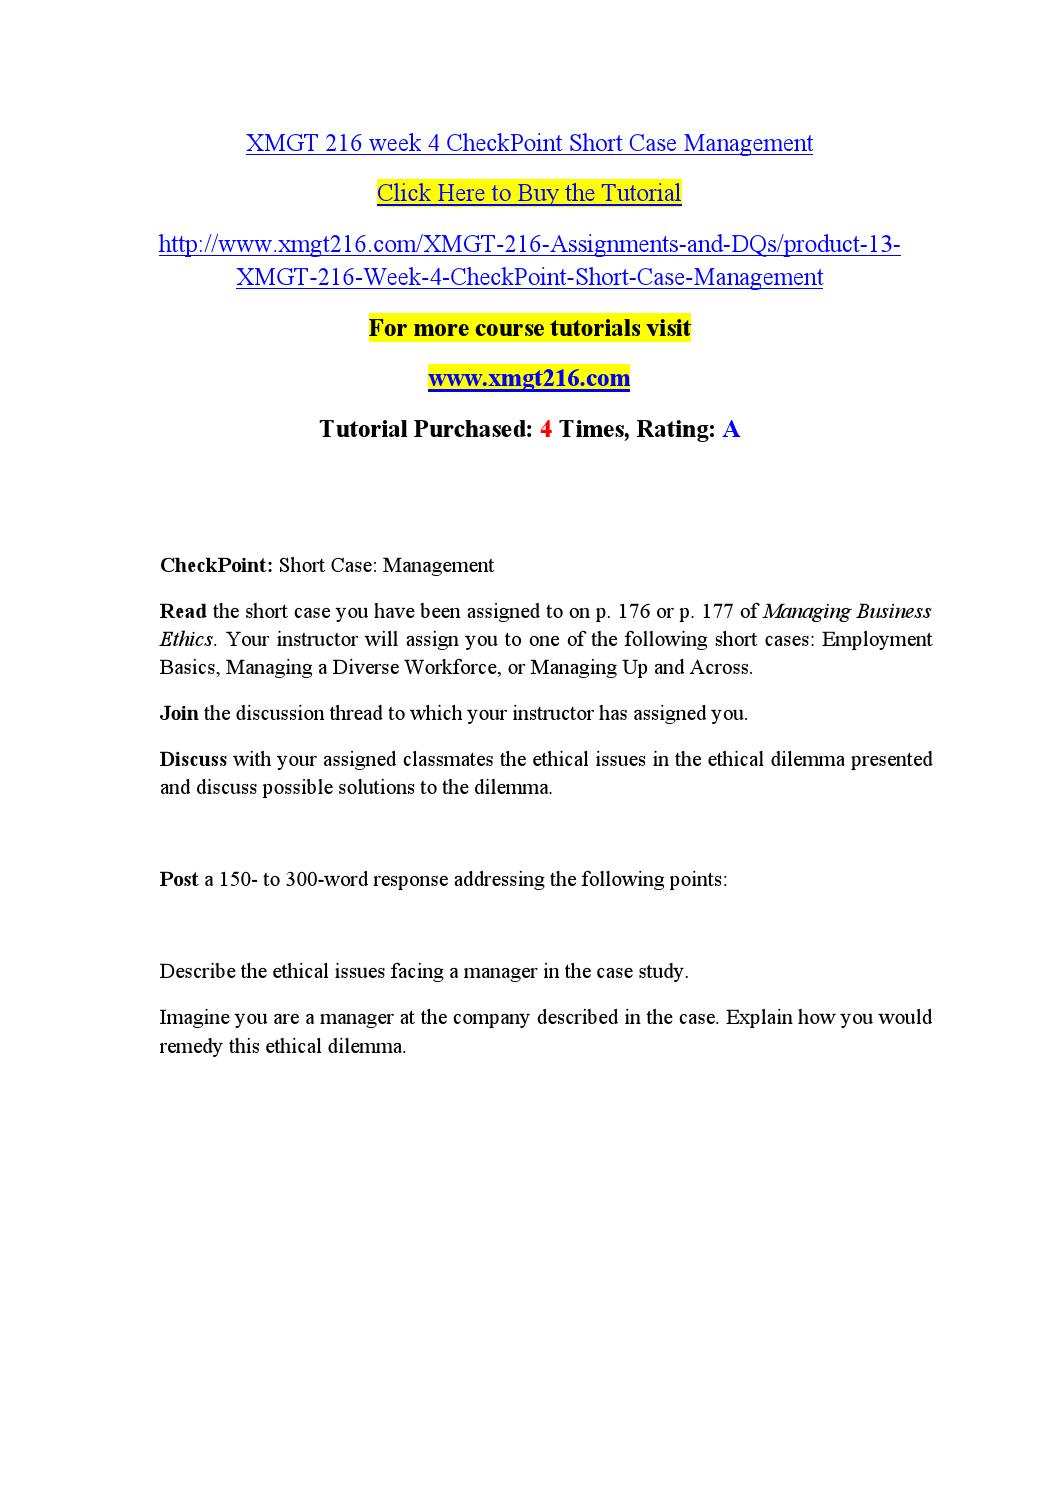 management case study xmgt 216